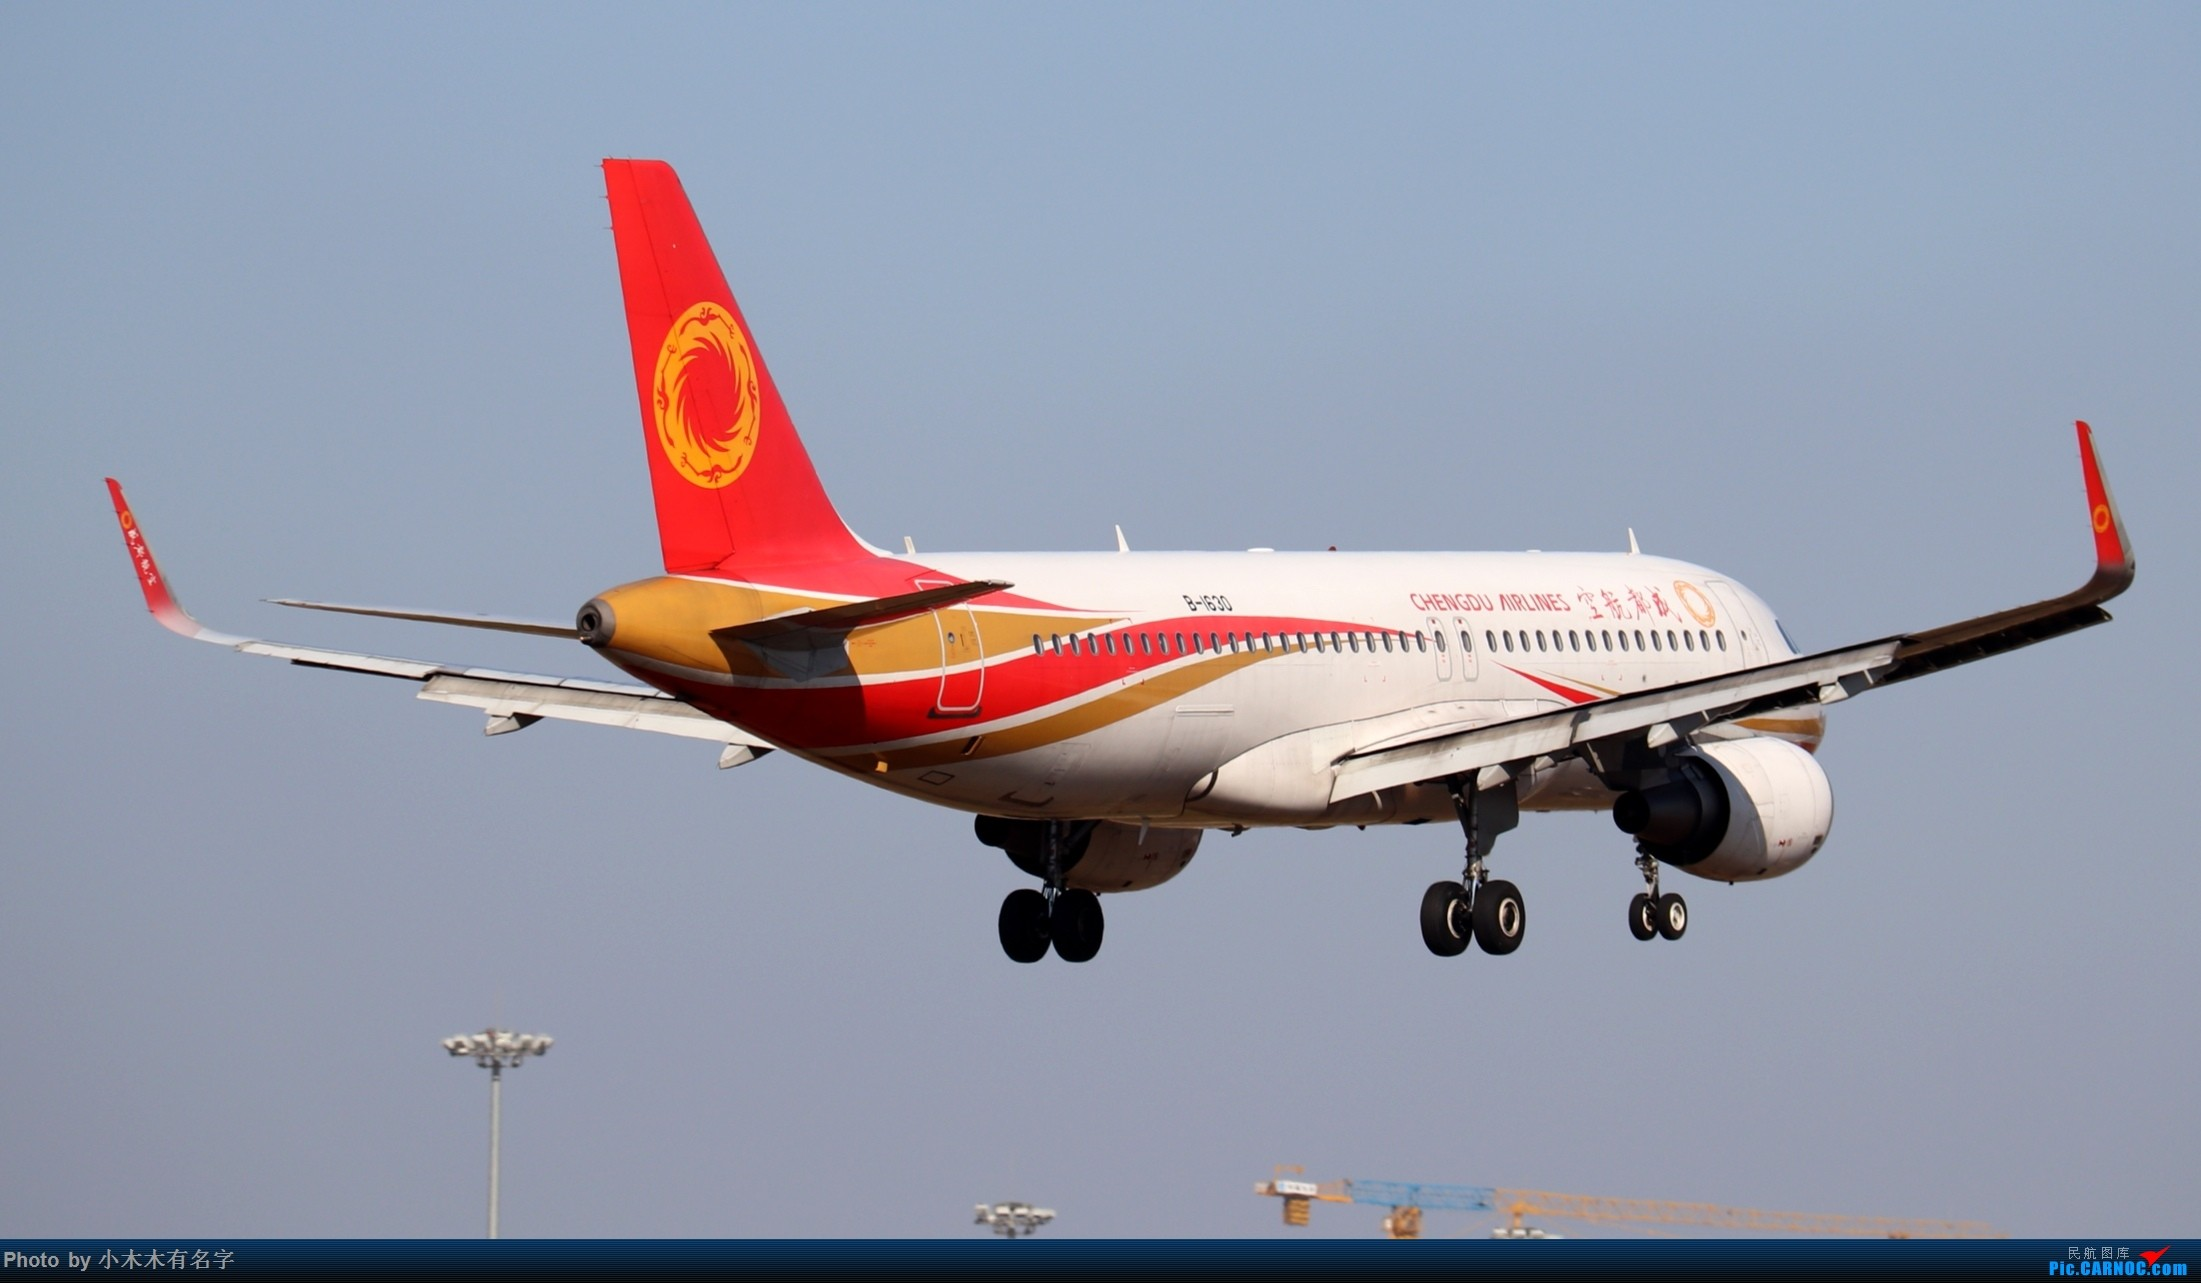 Re:[原创]2019冬天的海口美兰 AIRBUS A320-200 B-1630 中国海口美兰国际机场